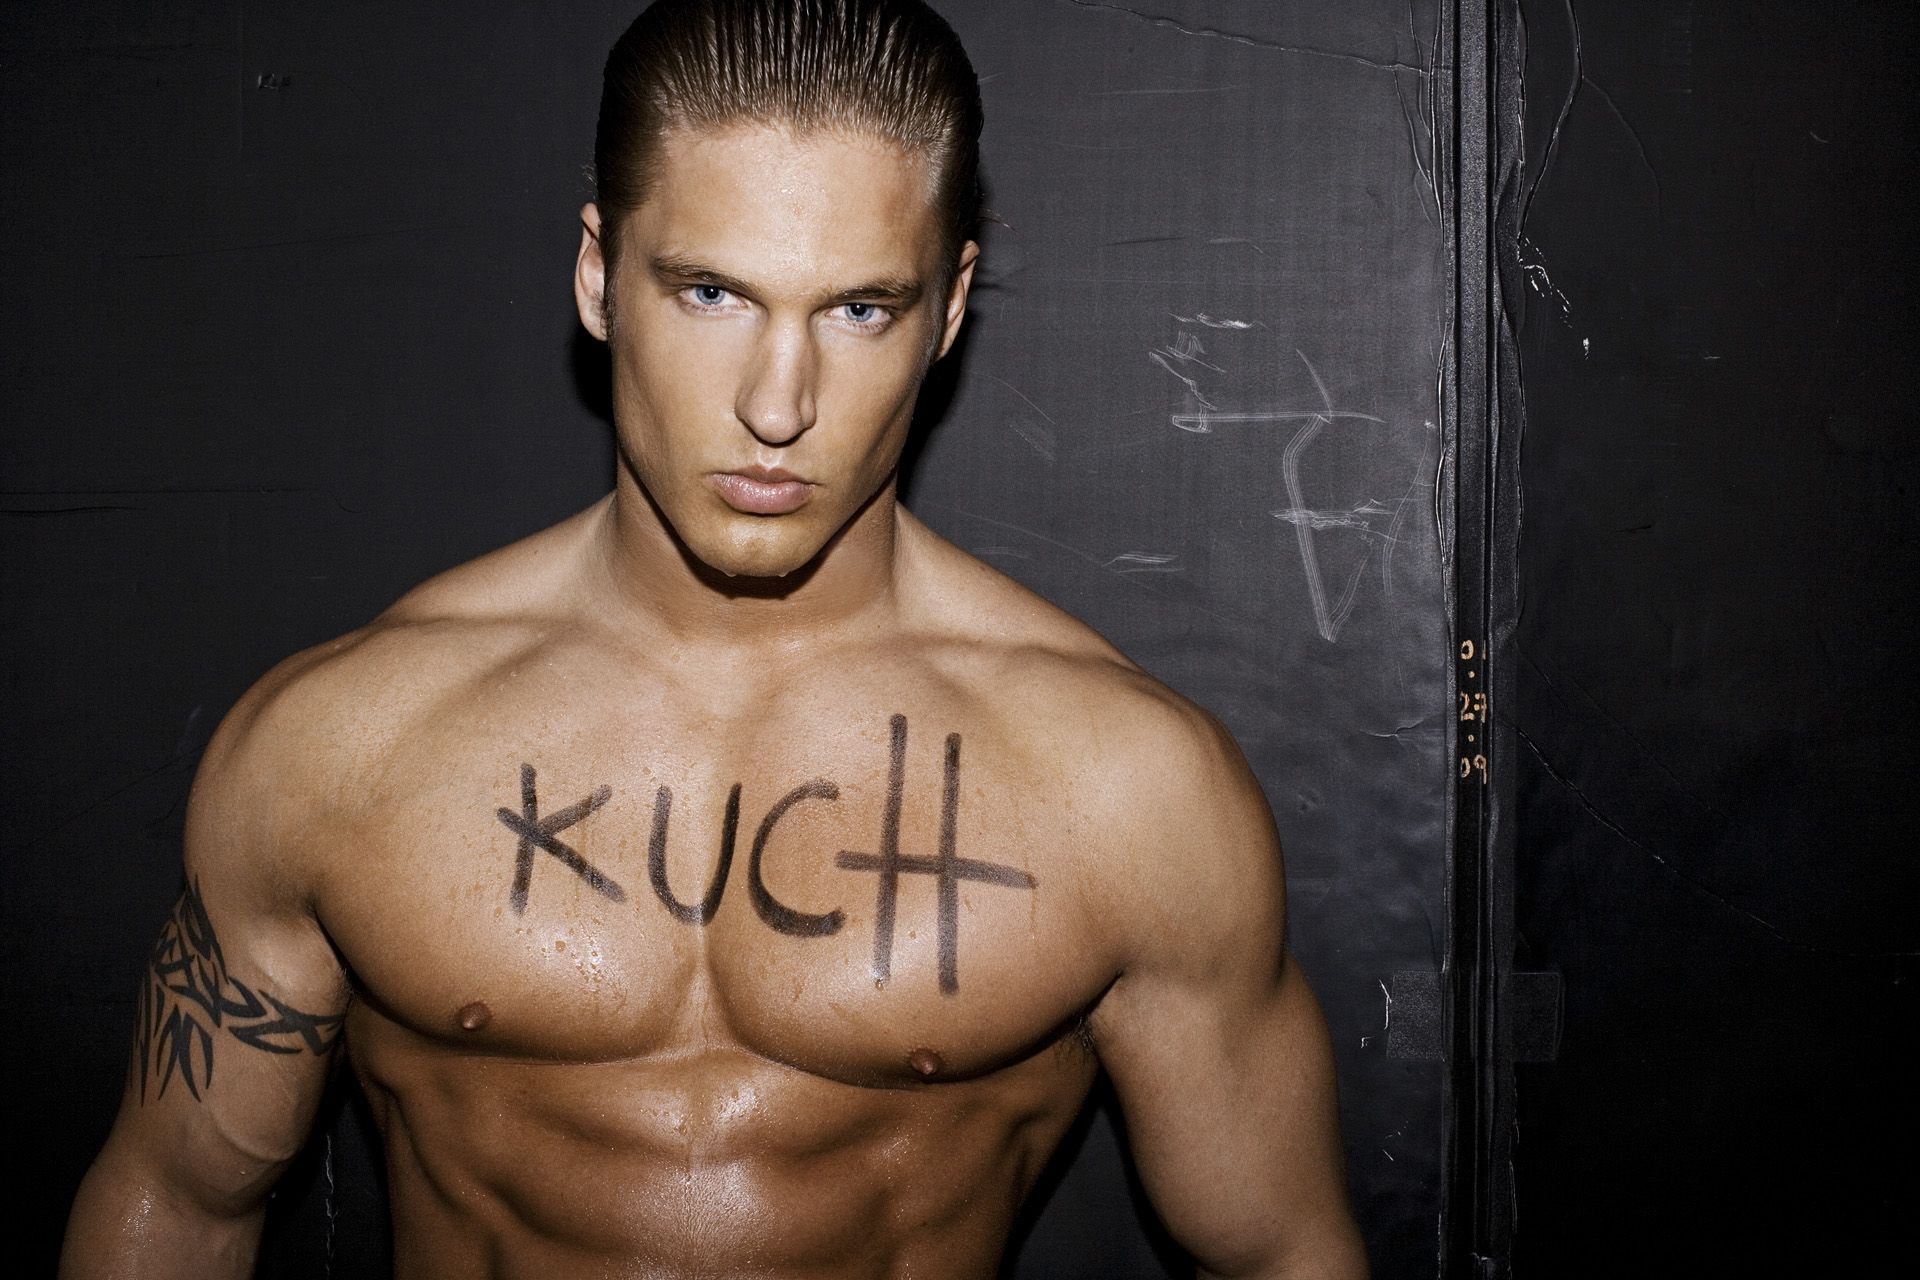 Very steve kuchinsky male model